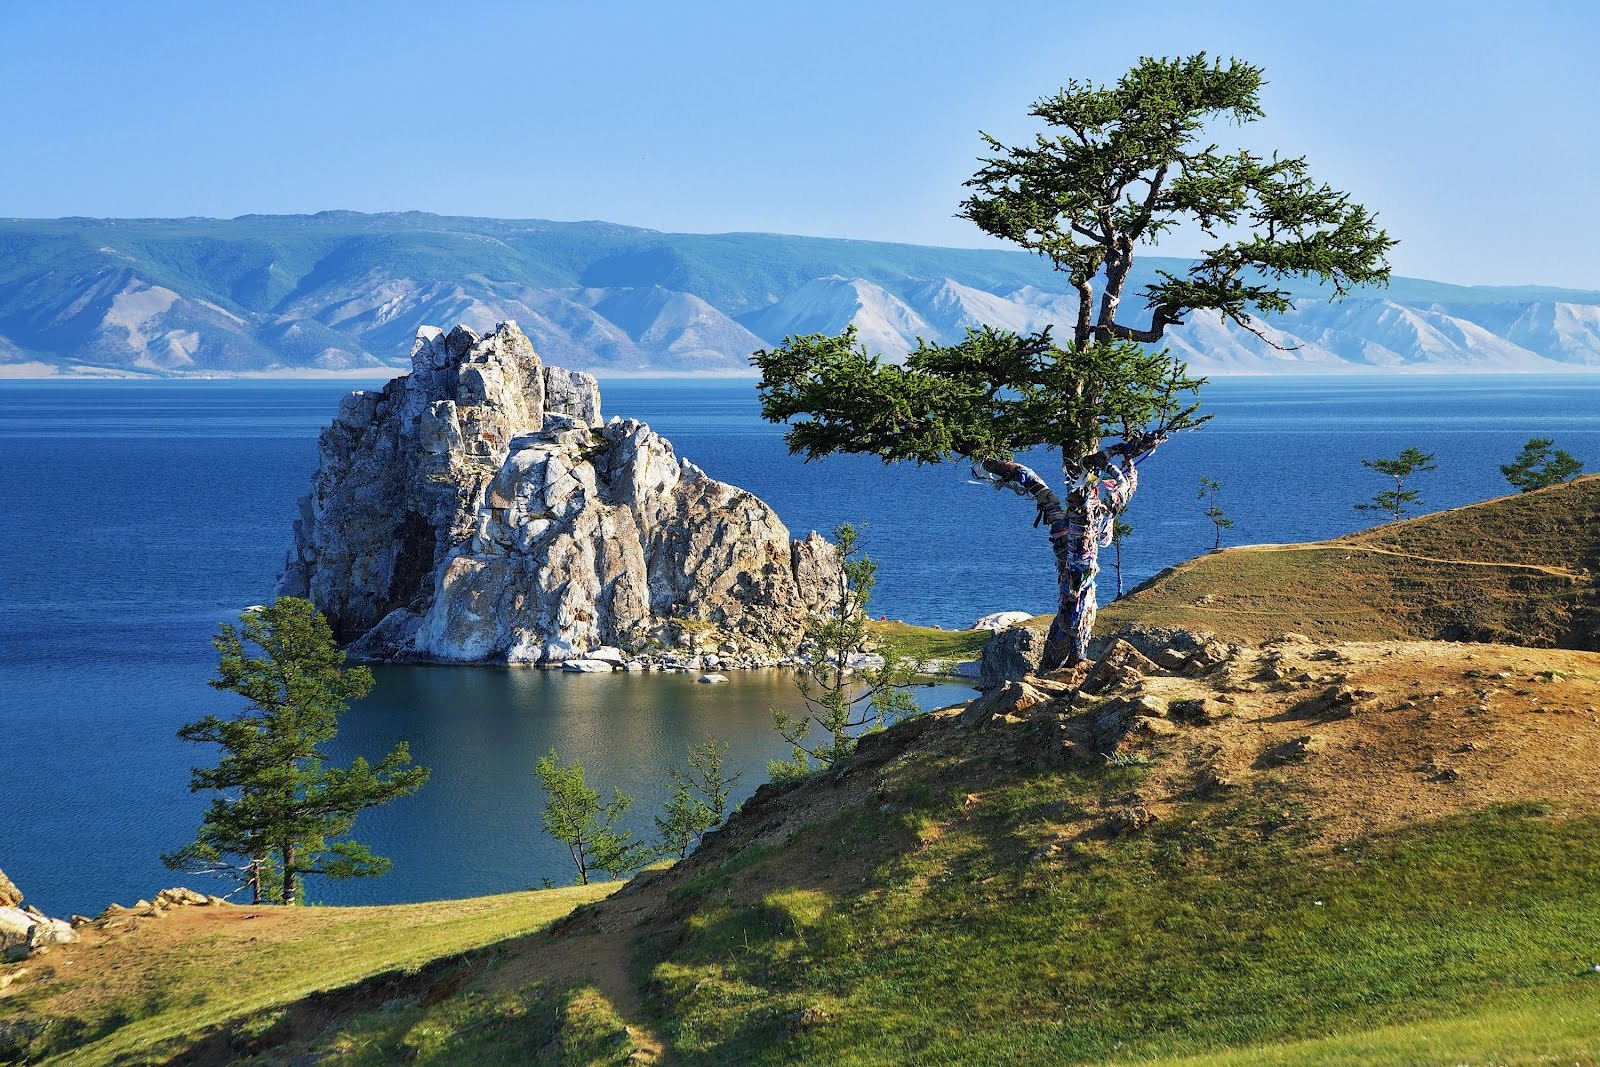 Озеро Байкал (14 фото)